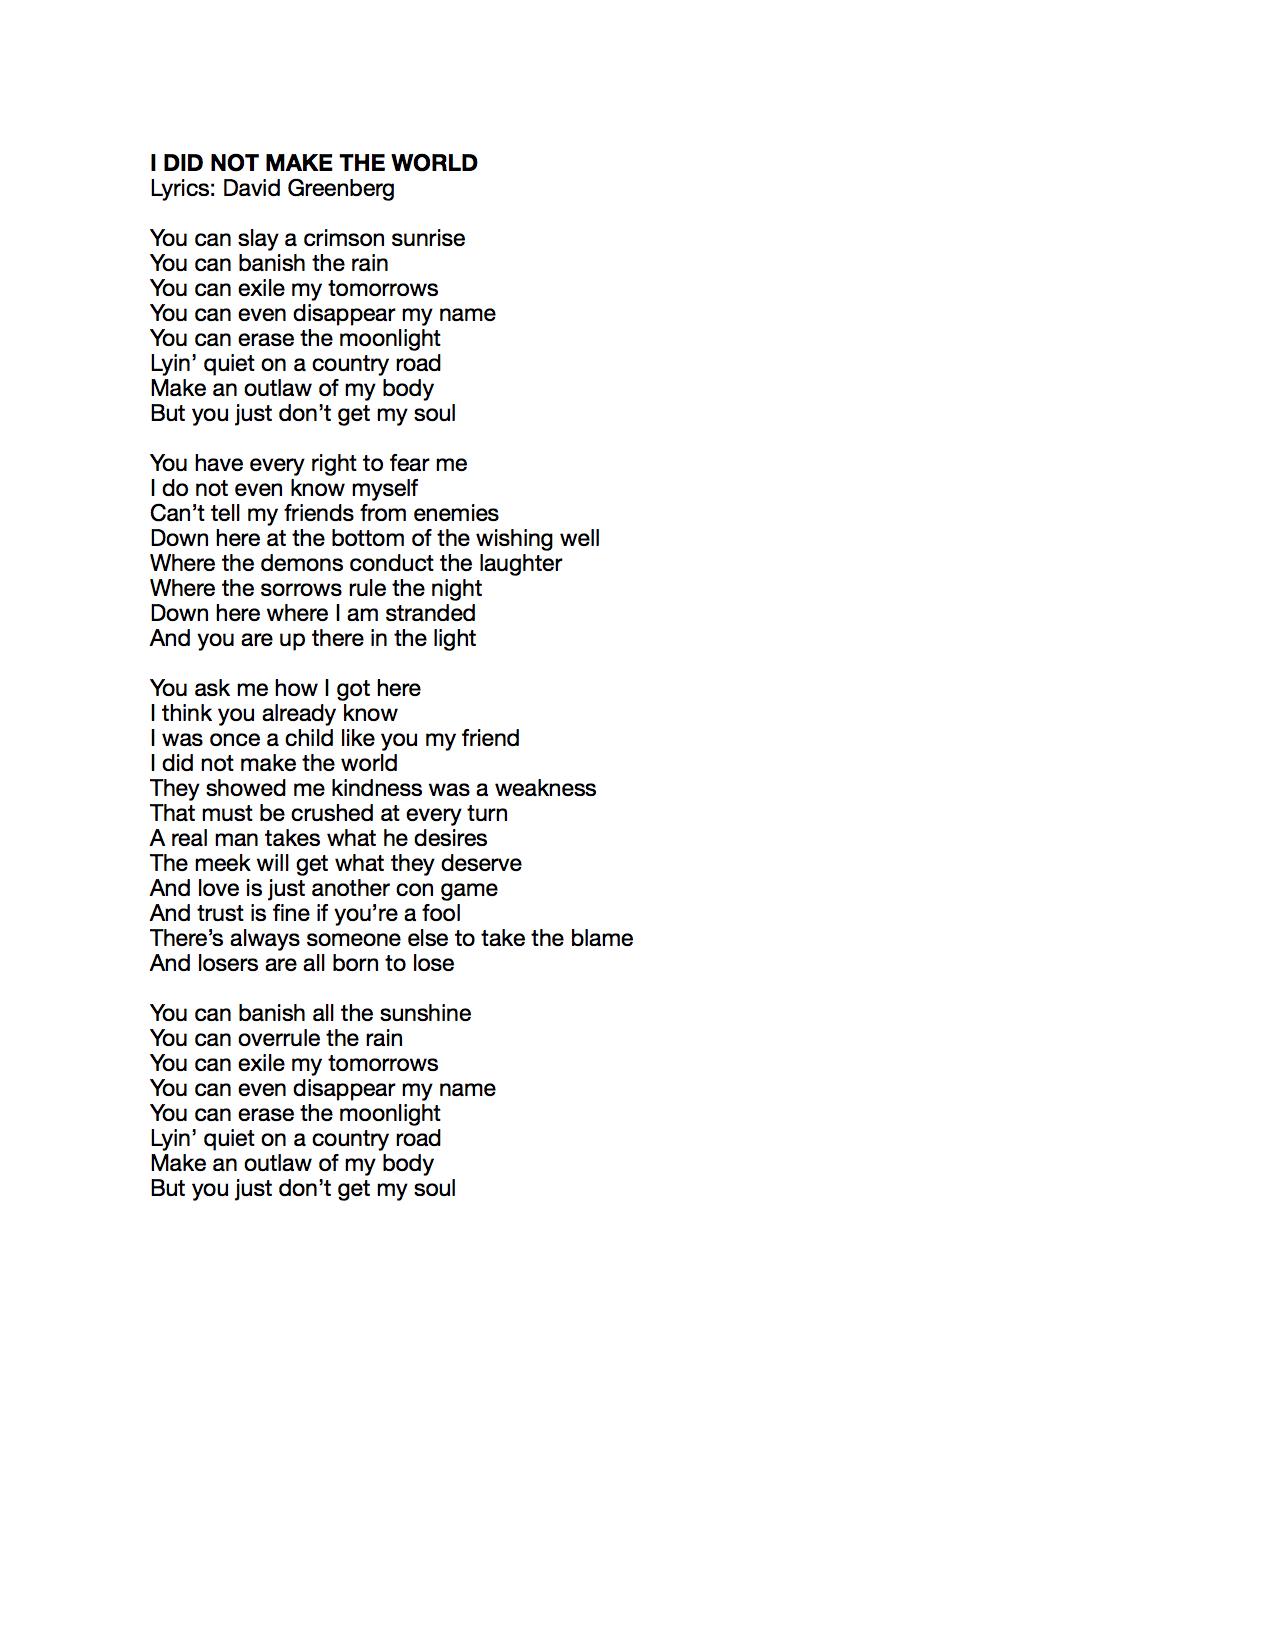 I Did Not Make the World Lyrics.jpeg